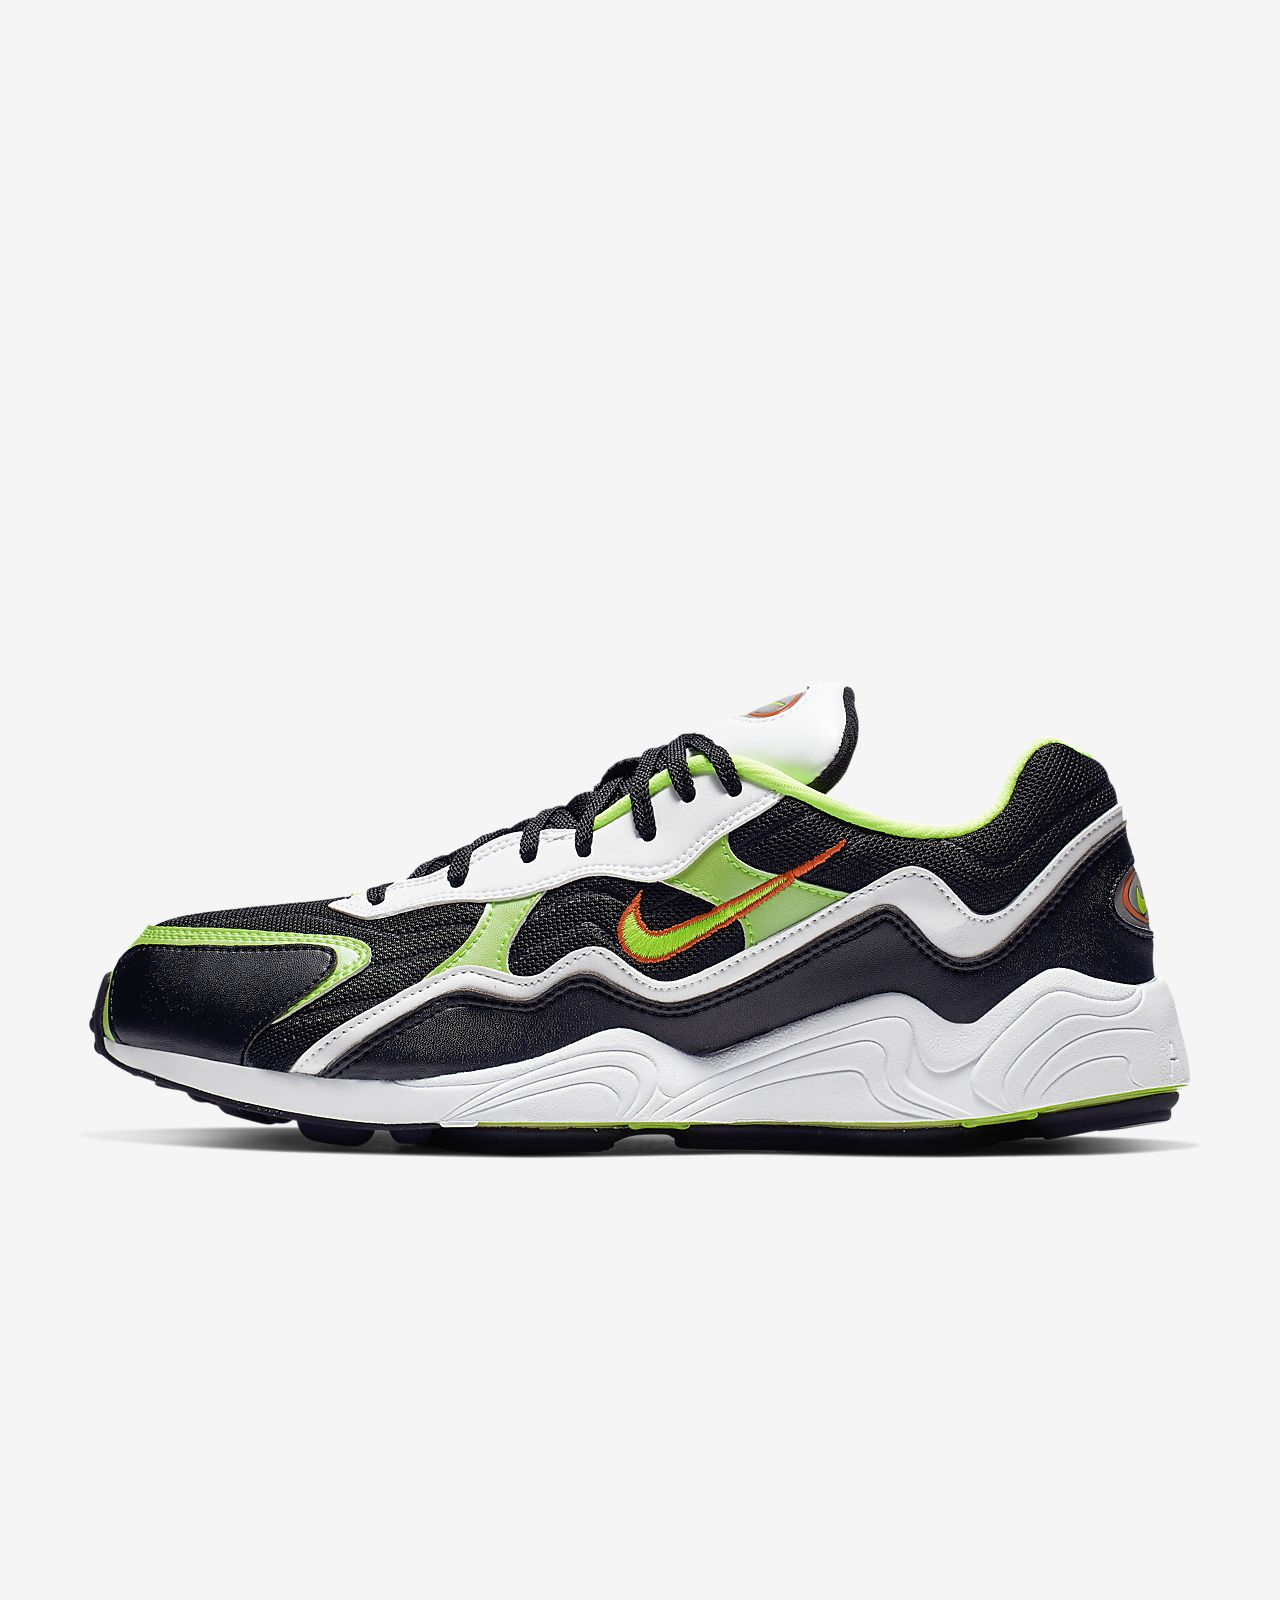 new product 40de9 54390 ... Nike Air Zoom Alpha Zapatillas - Hombre